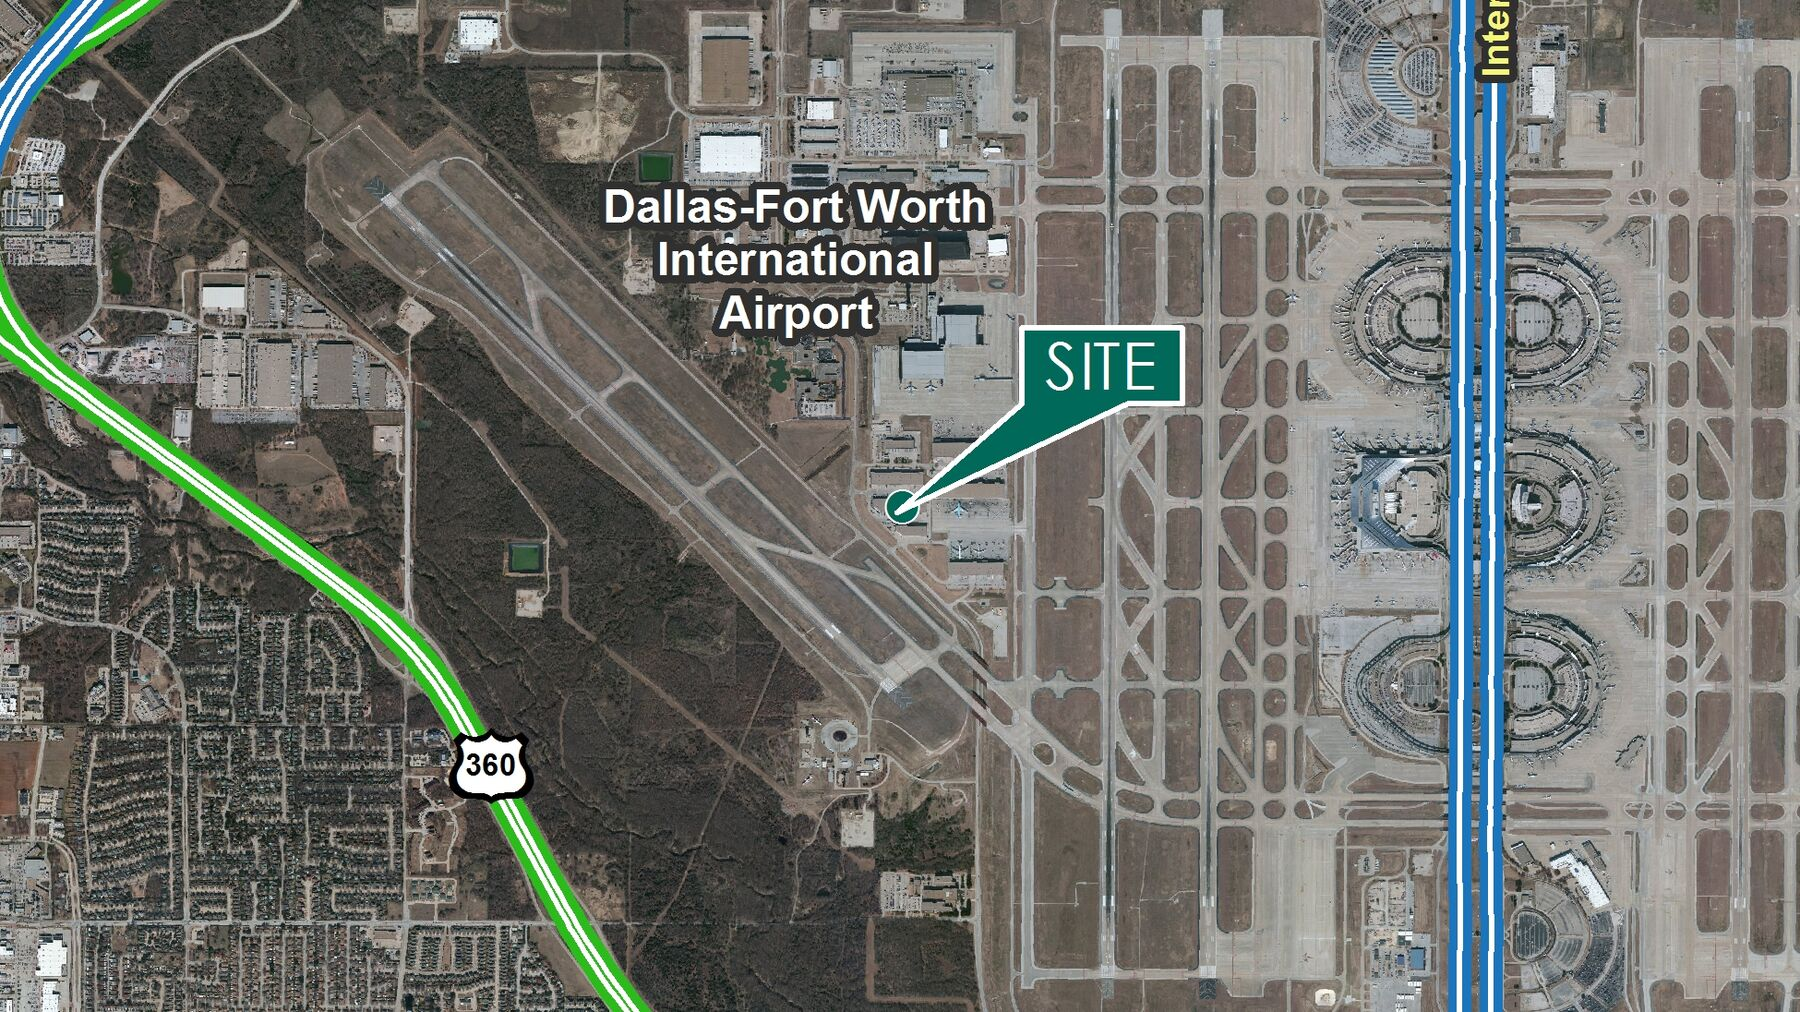 DPM-Prologis-DFW-7-DAL09307-2450-W-Airfield-Drive_AerialMap.jpg